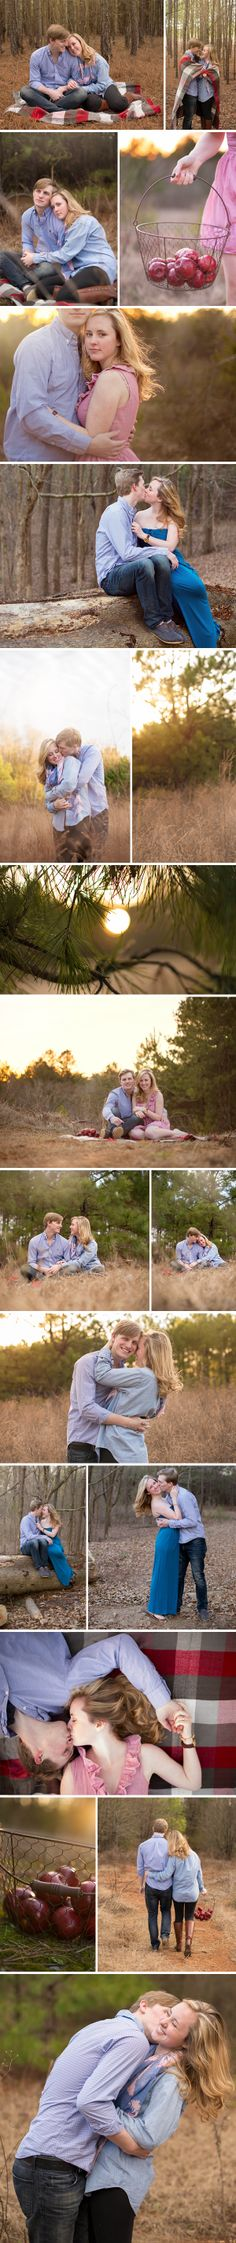 Couples session| Randi Vasquez Photography